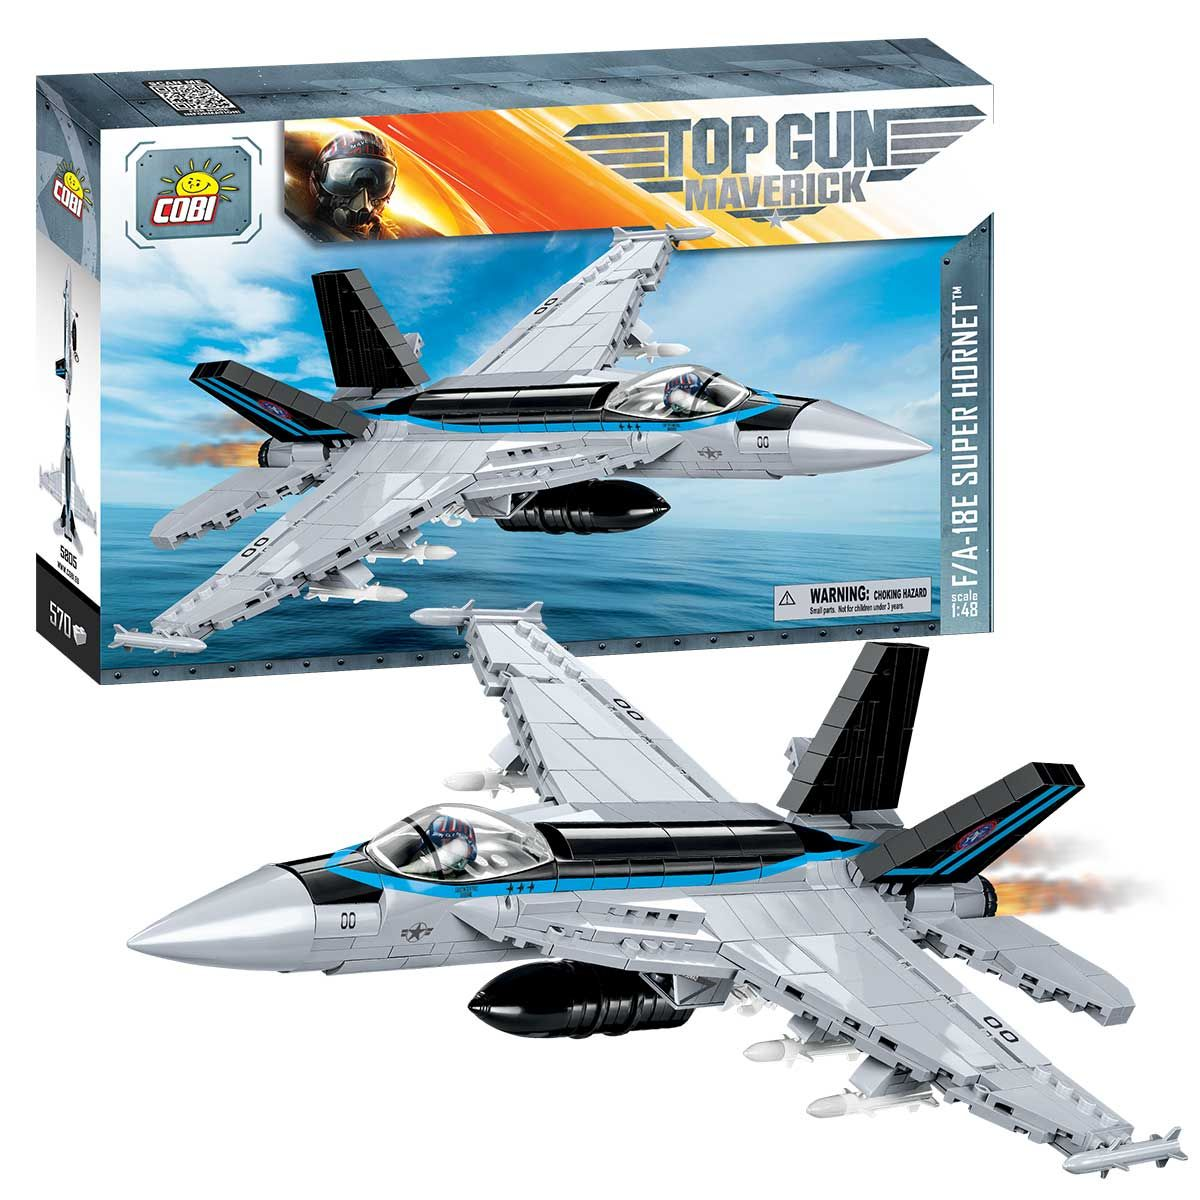 Top Gun Maverick F/A-18E Super Hornet - 580 deler